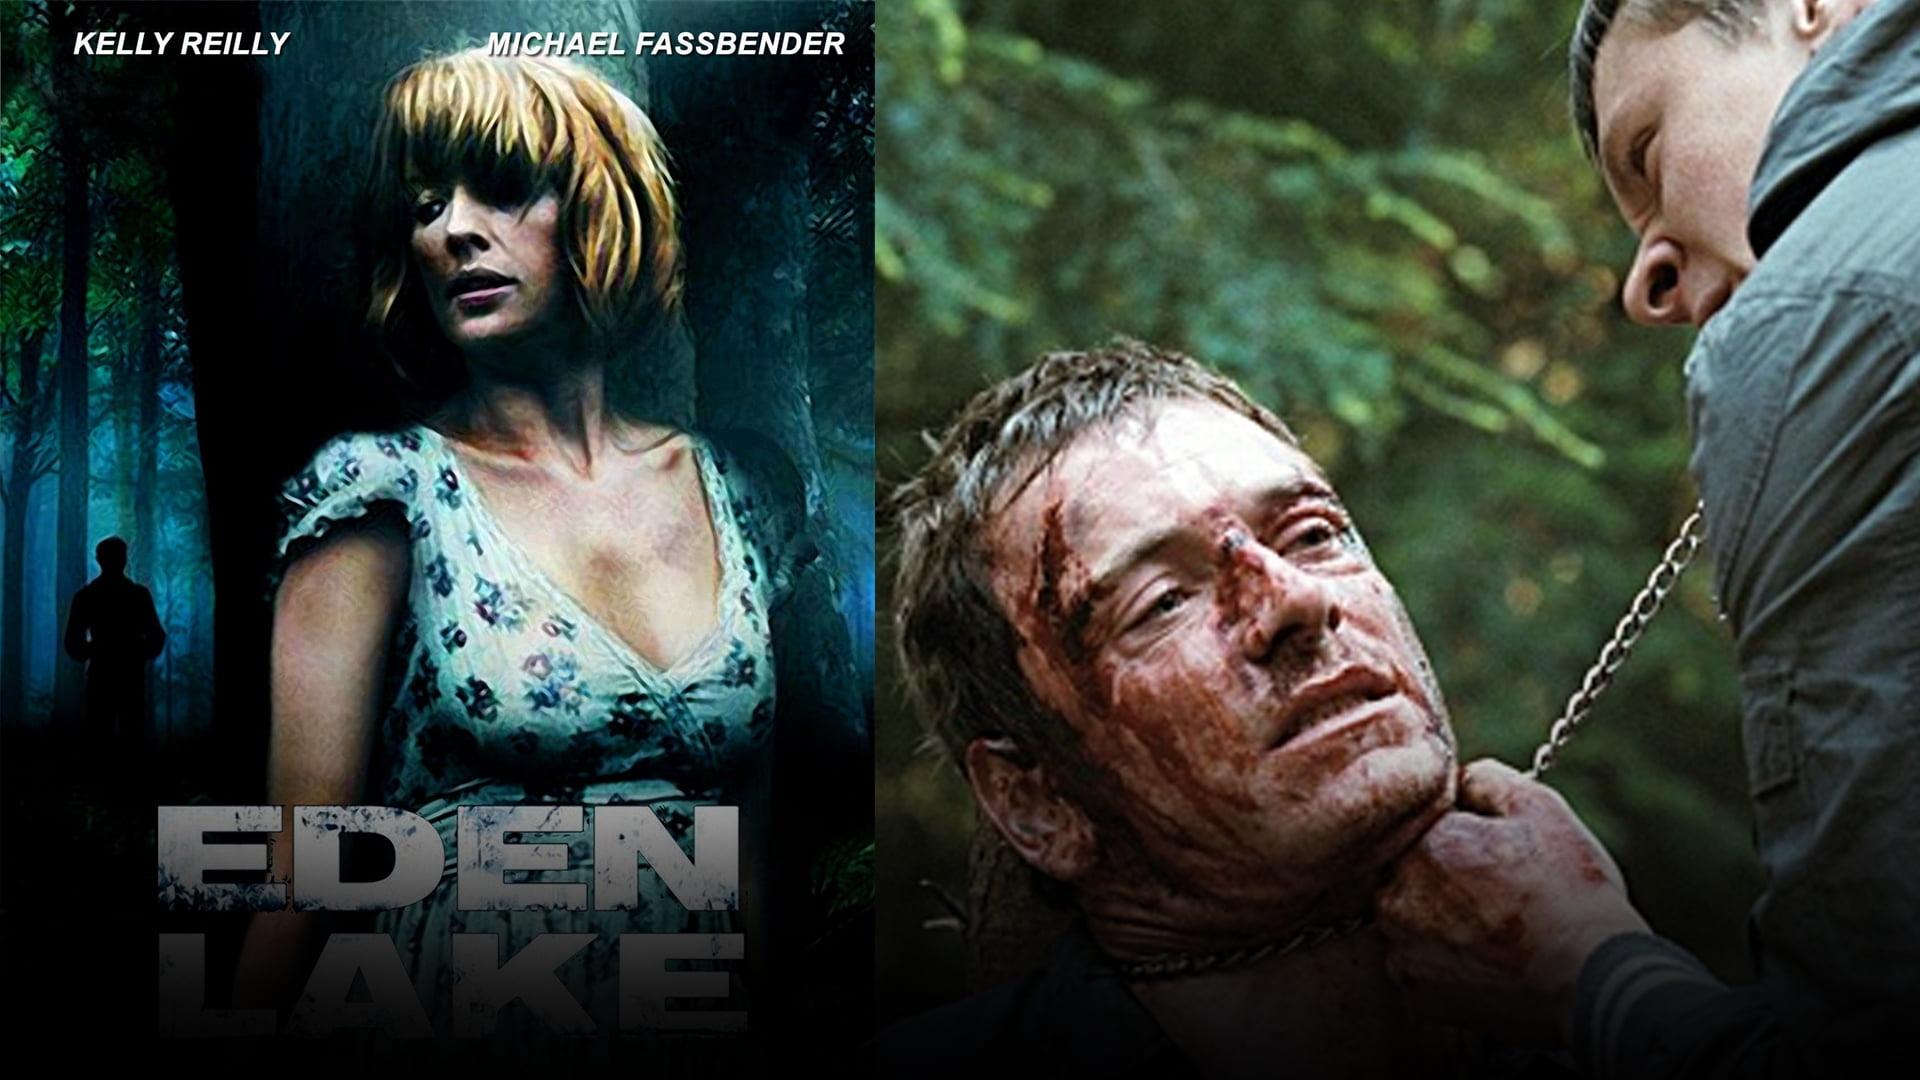 Most-emotional-movie-eden-lake-2008